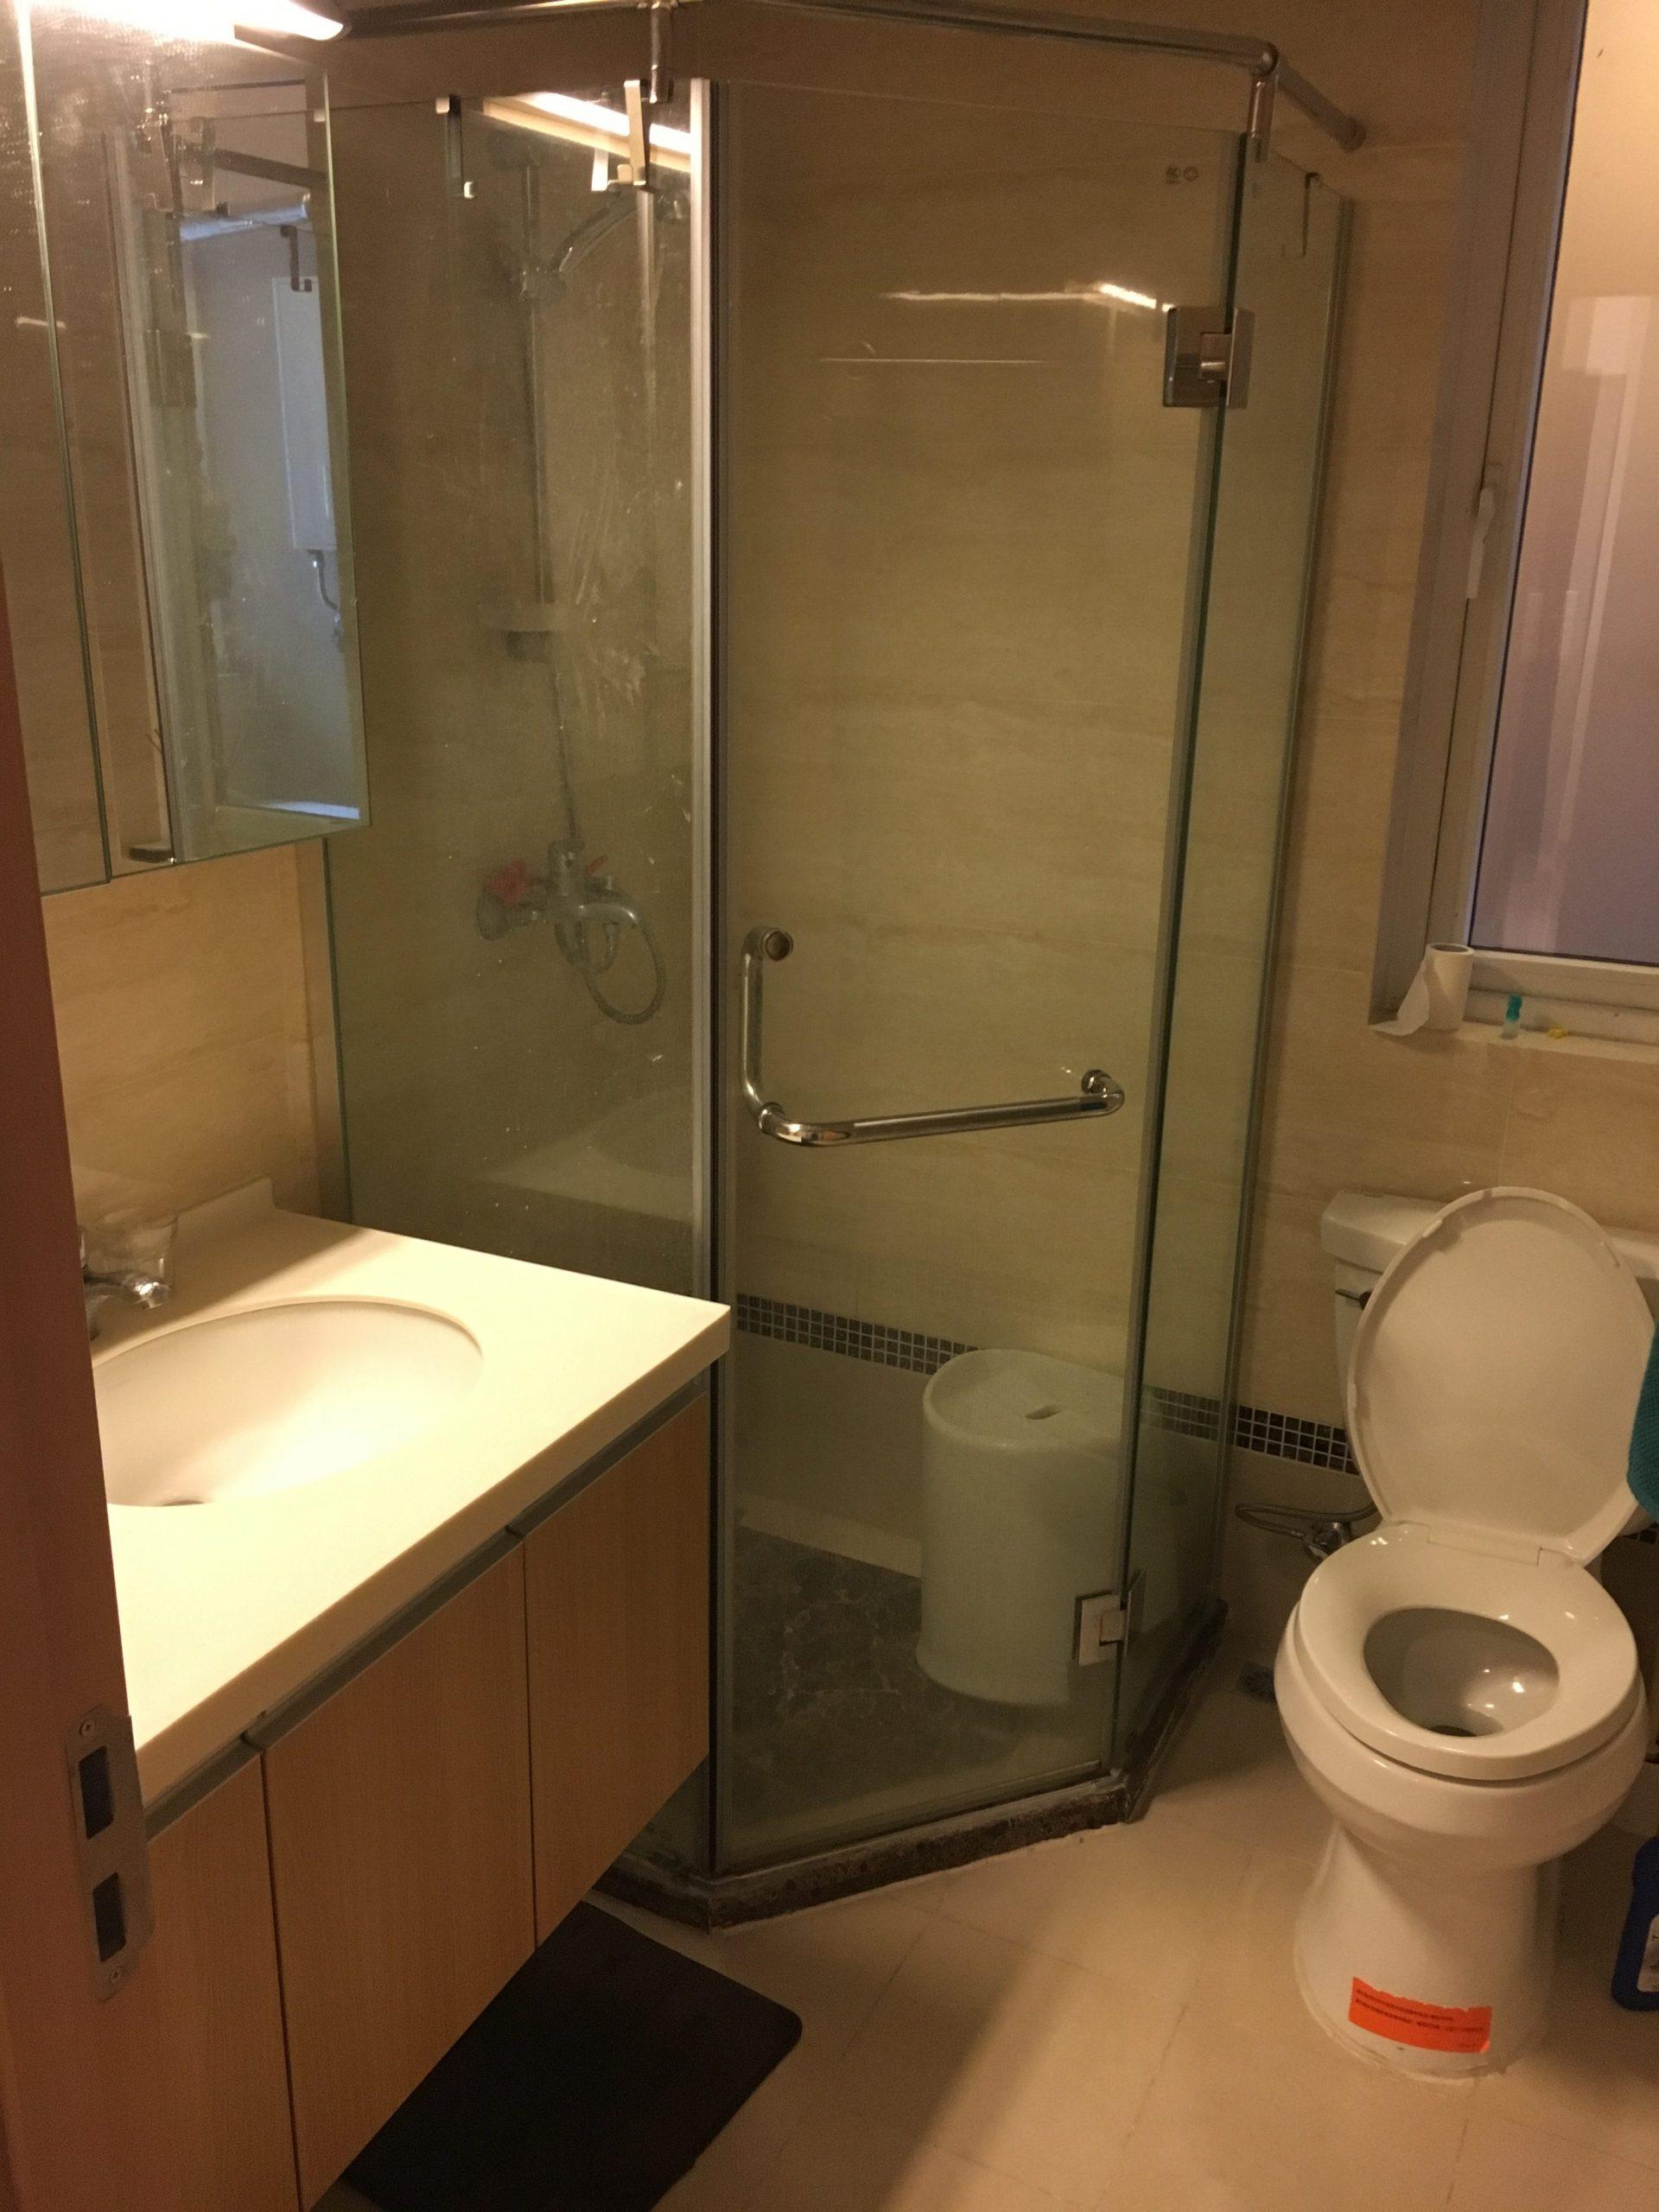 TEFL teachers apartment at EF Chongqing. Bathroom